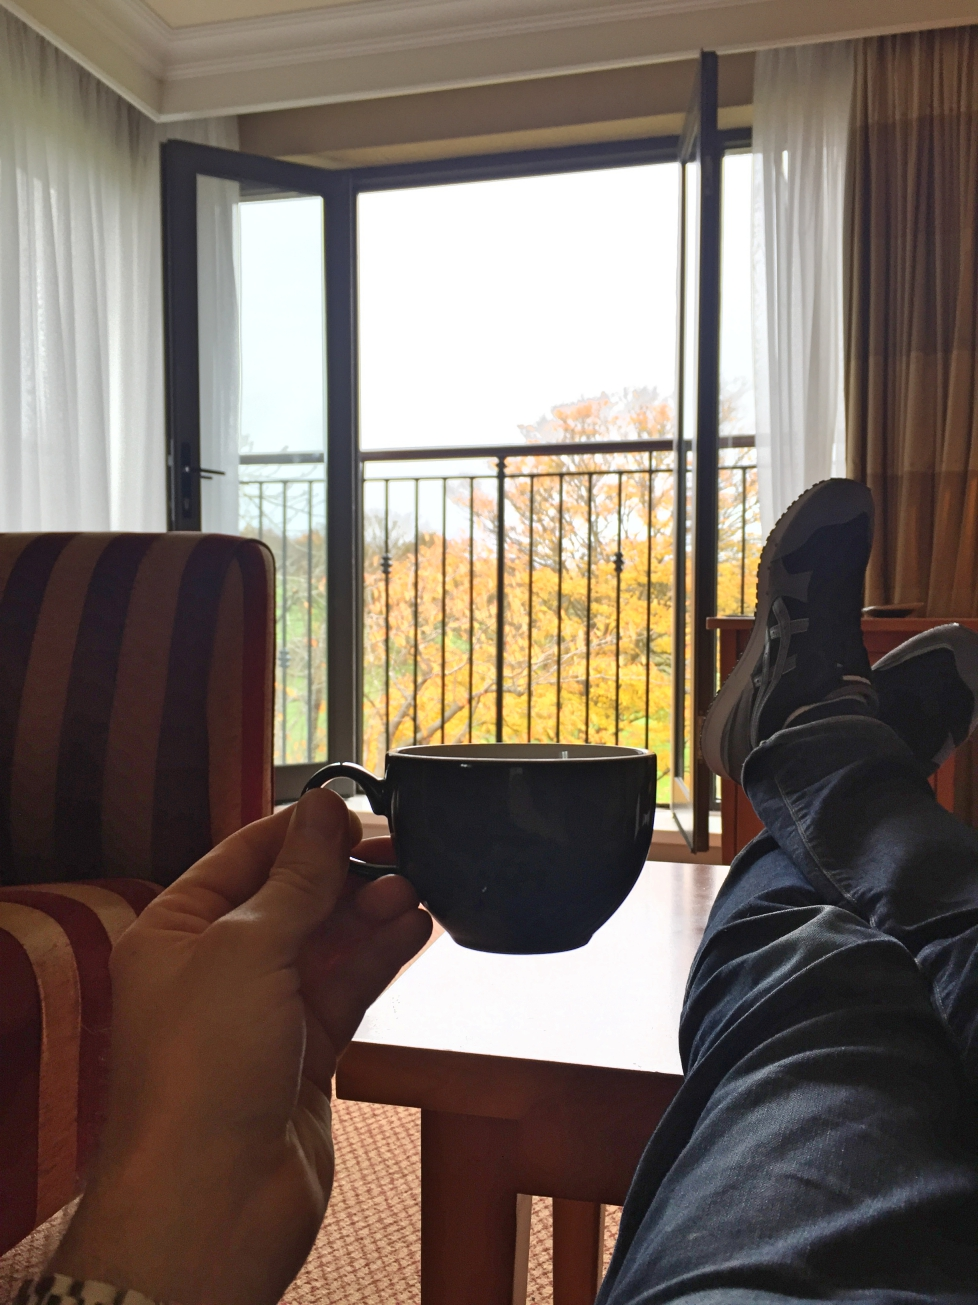 limavady_roe_park_resort_hotel_niexplorer_ni_explorer_northern_ireland (4).jpg